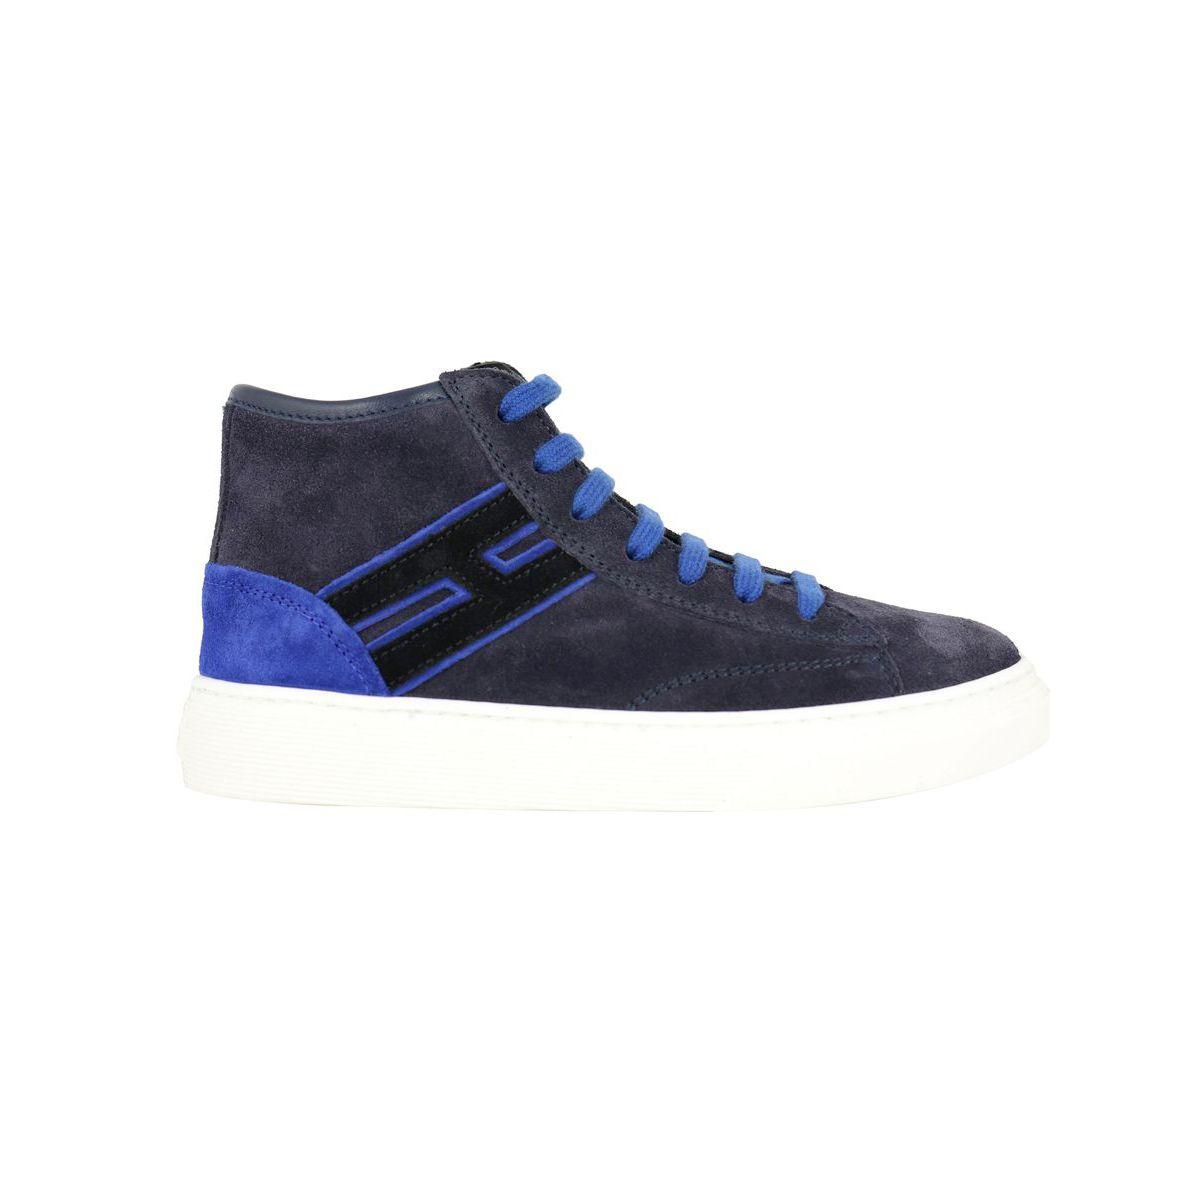 FONDO 340 HI TOP high-top sneakers + lining Blue Hogan